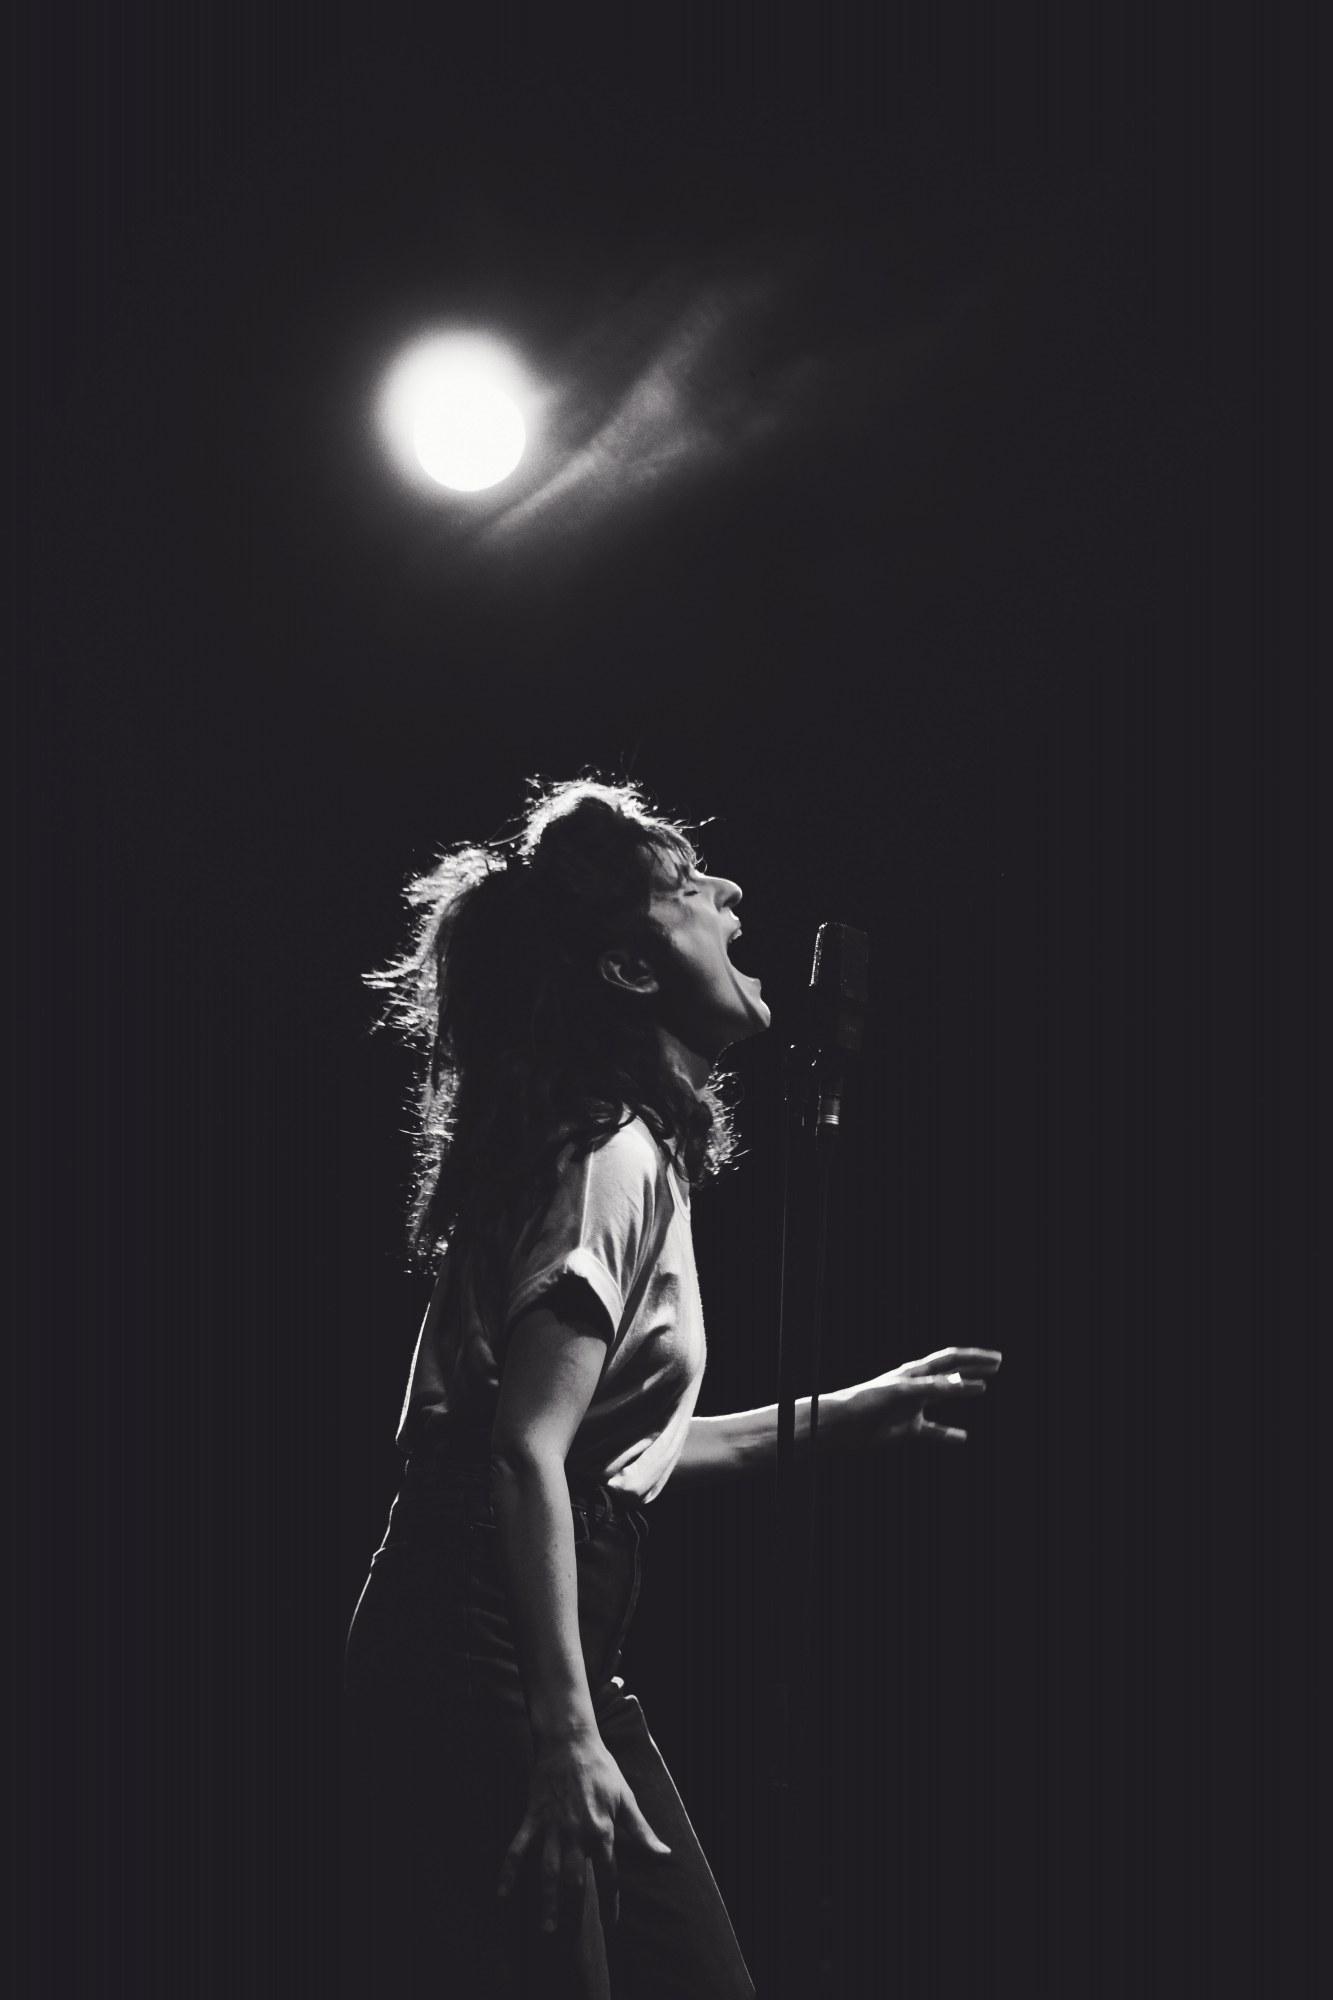 © PUK-Samia Hamlaoui